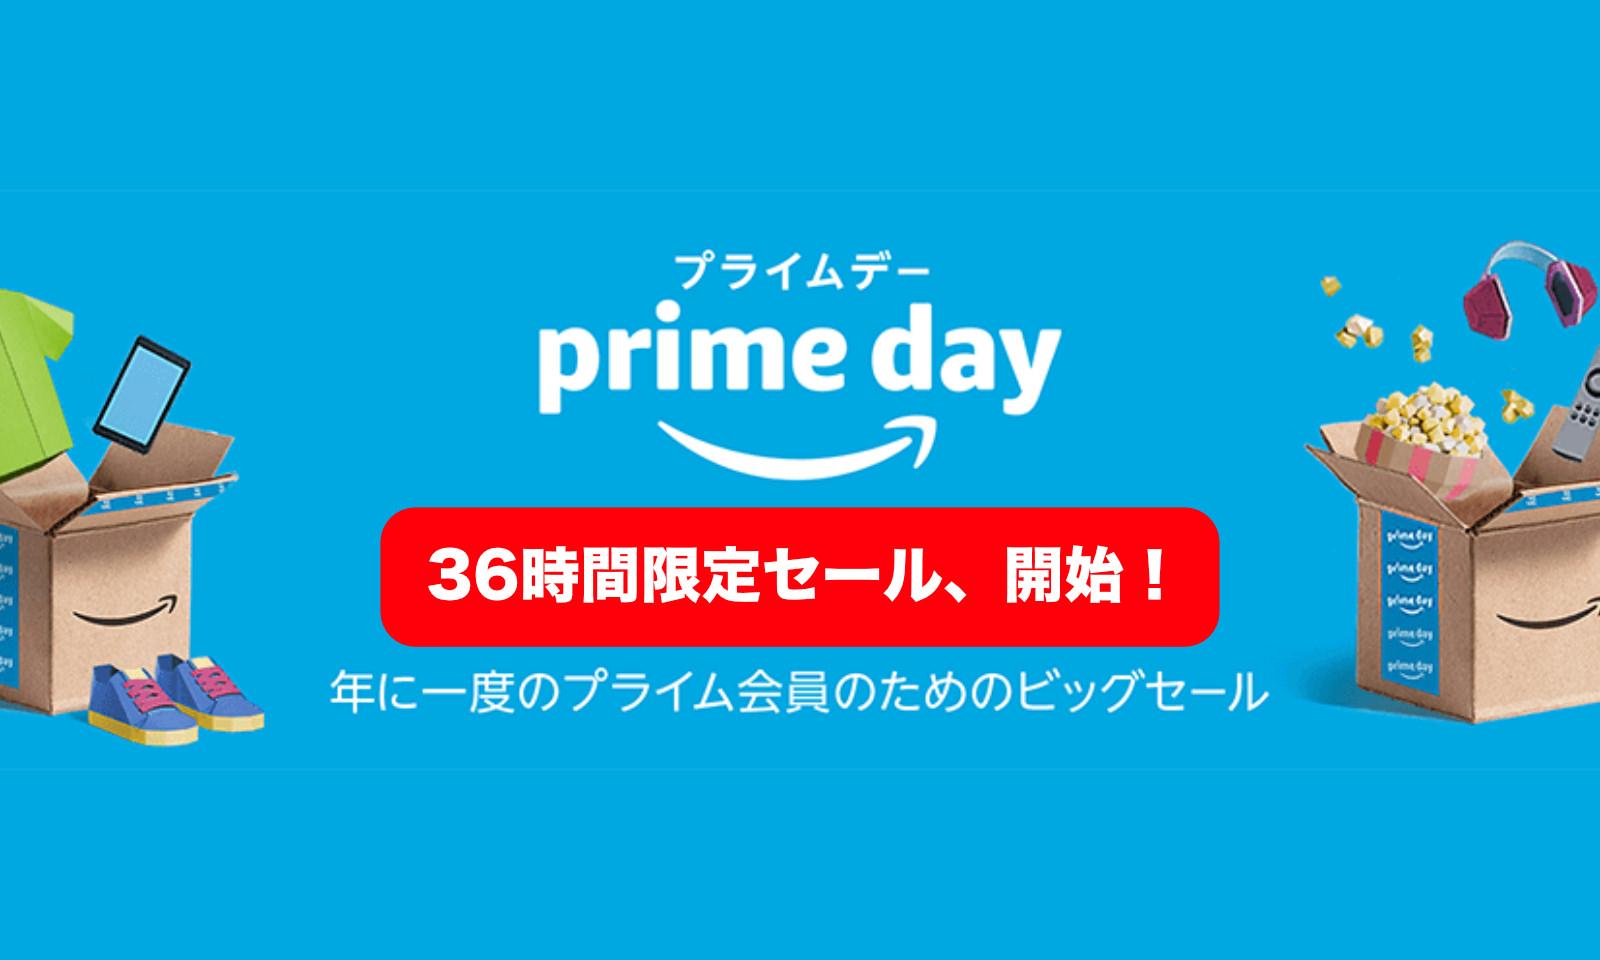 Prime Day 2018 Start